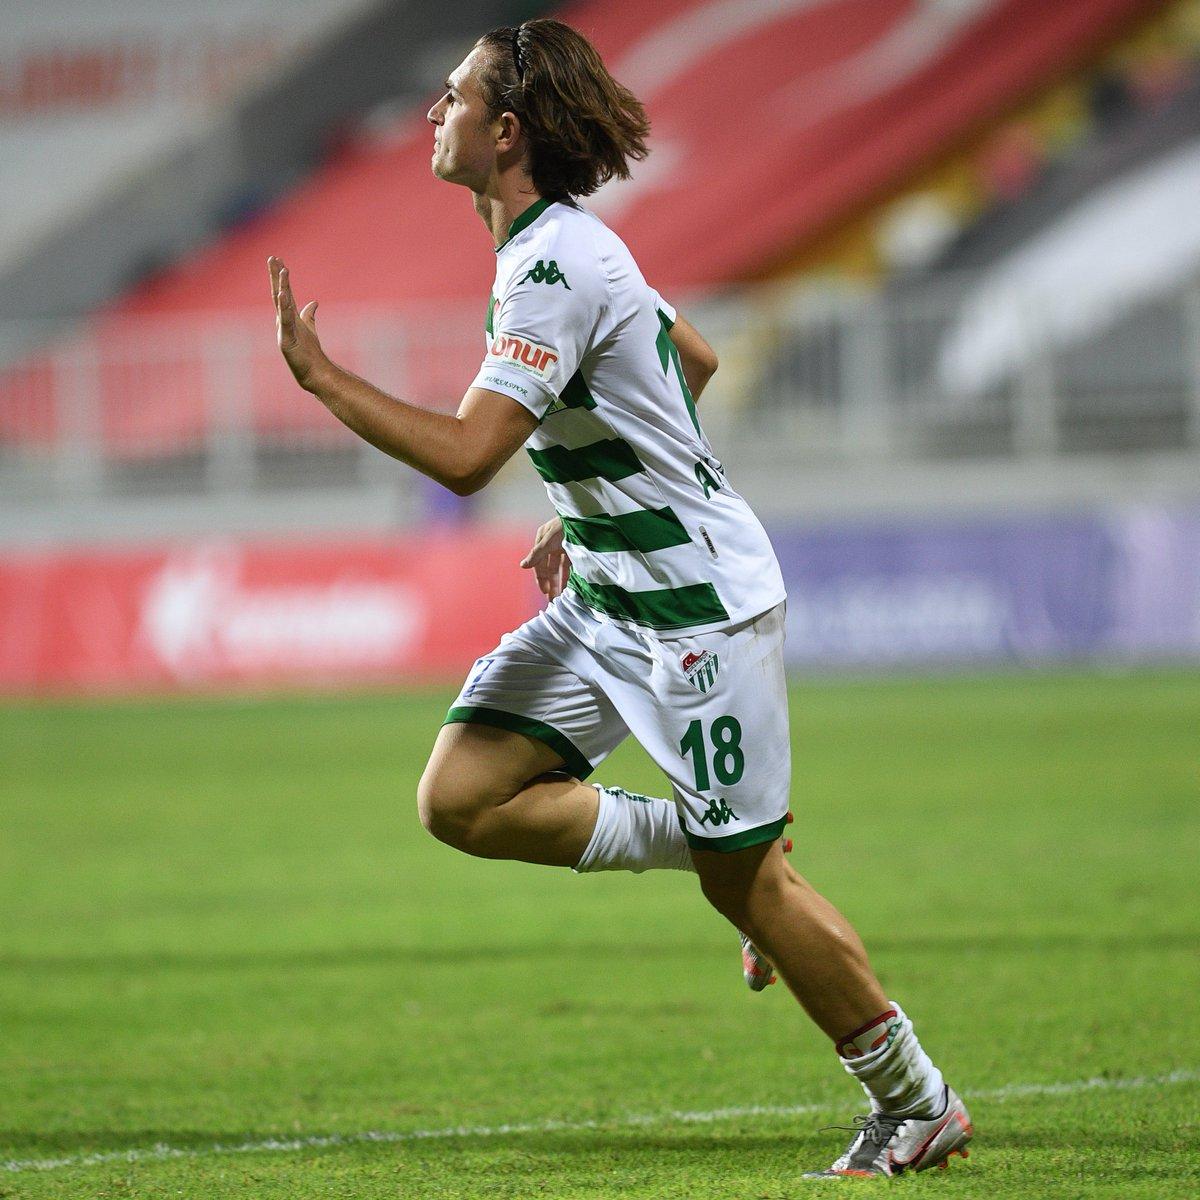 🐊Ali Akman'ın gol sevinci https://t.co/X8j1h1H8N9